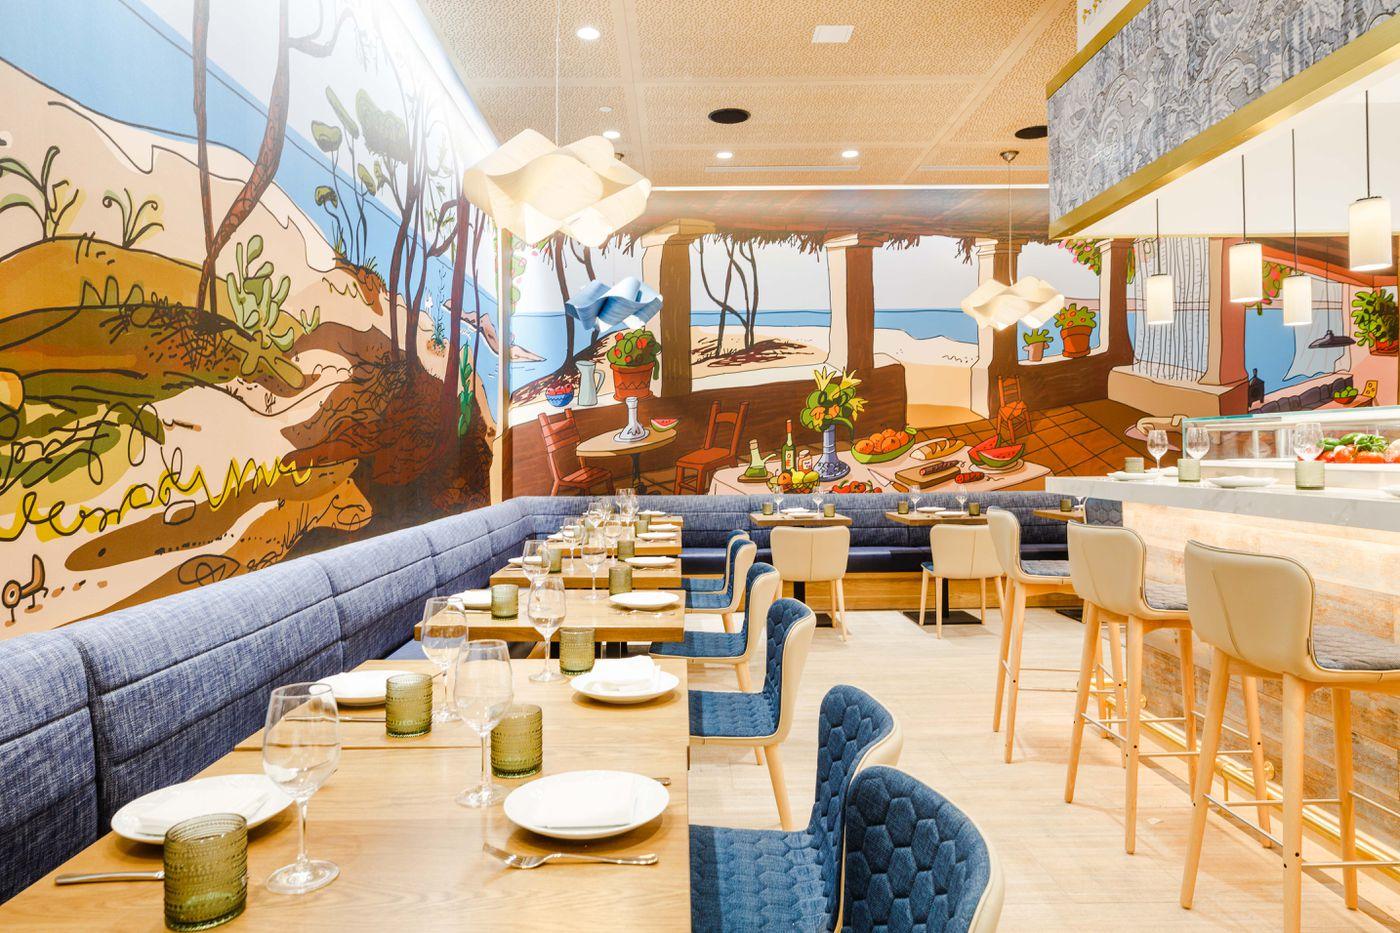 Mercado Little Spain José Andrés Colossal Hudson Yards Food Hall Opens Friday Eater Ny